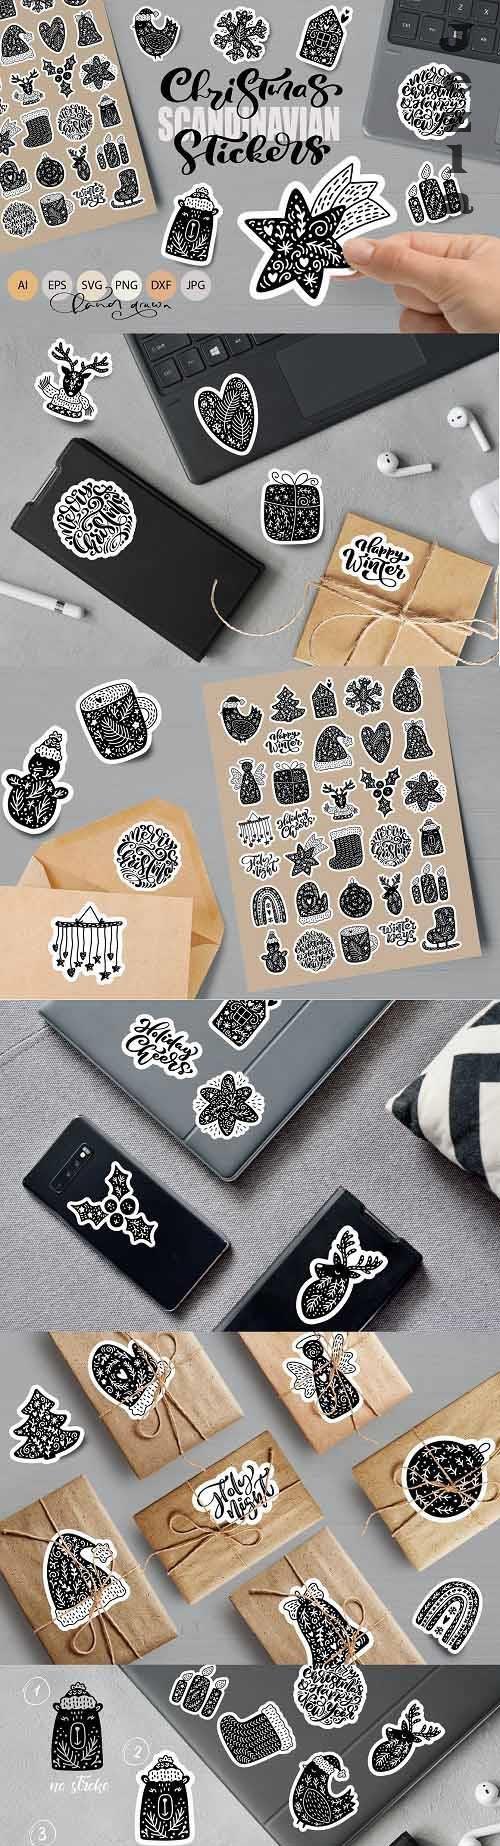 Christmas Scandinavian Stickers - 6545610